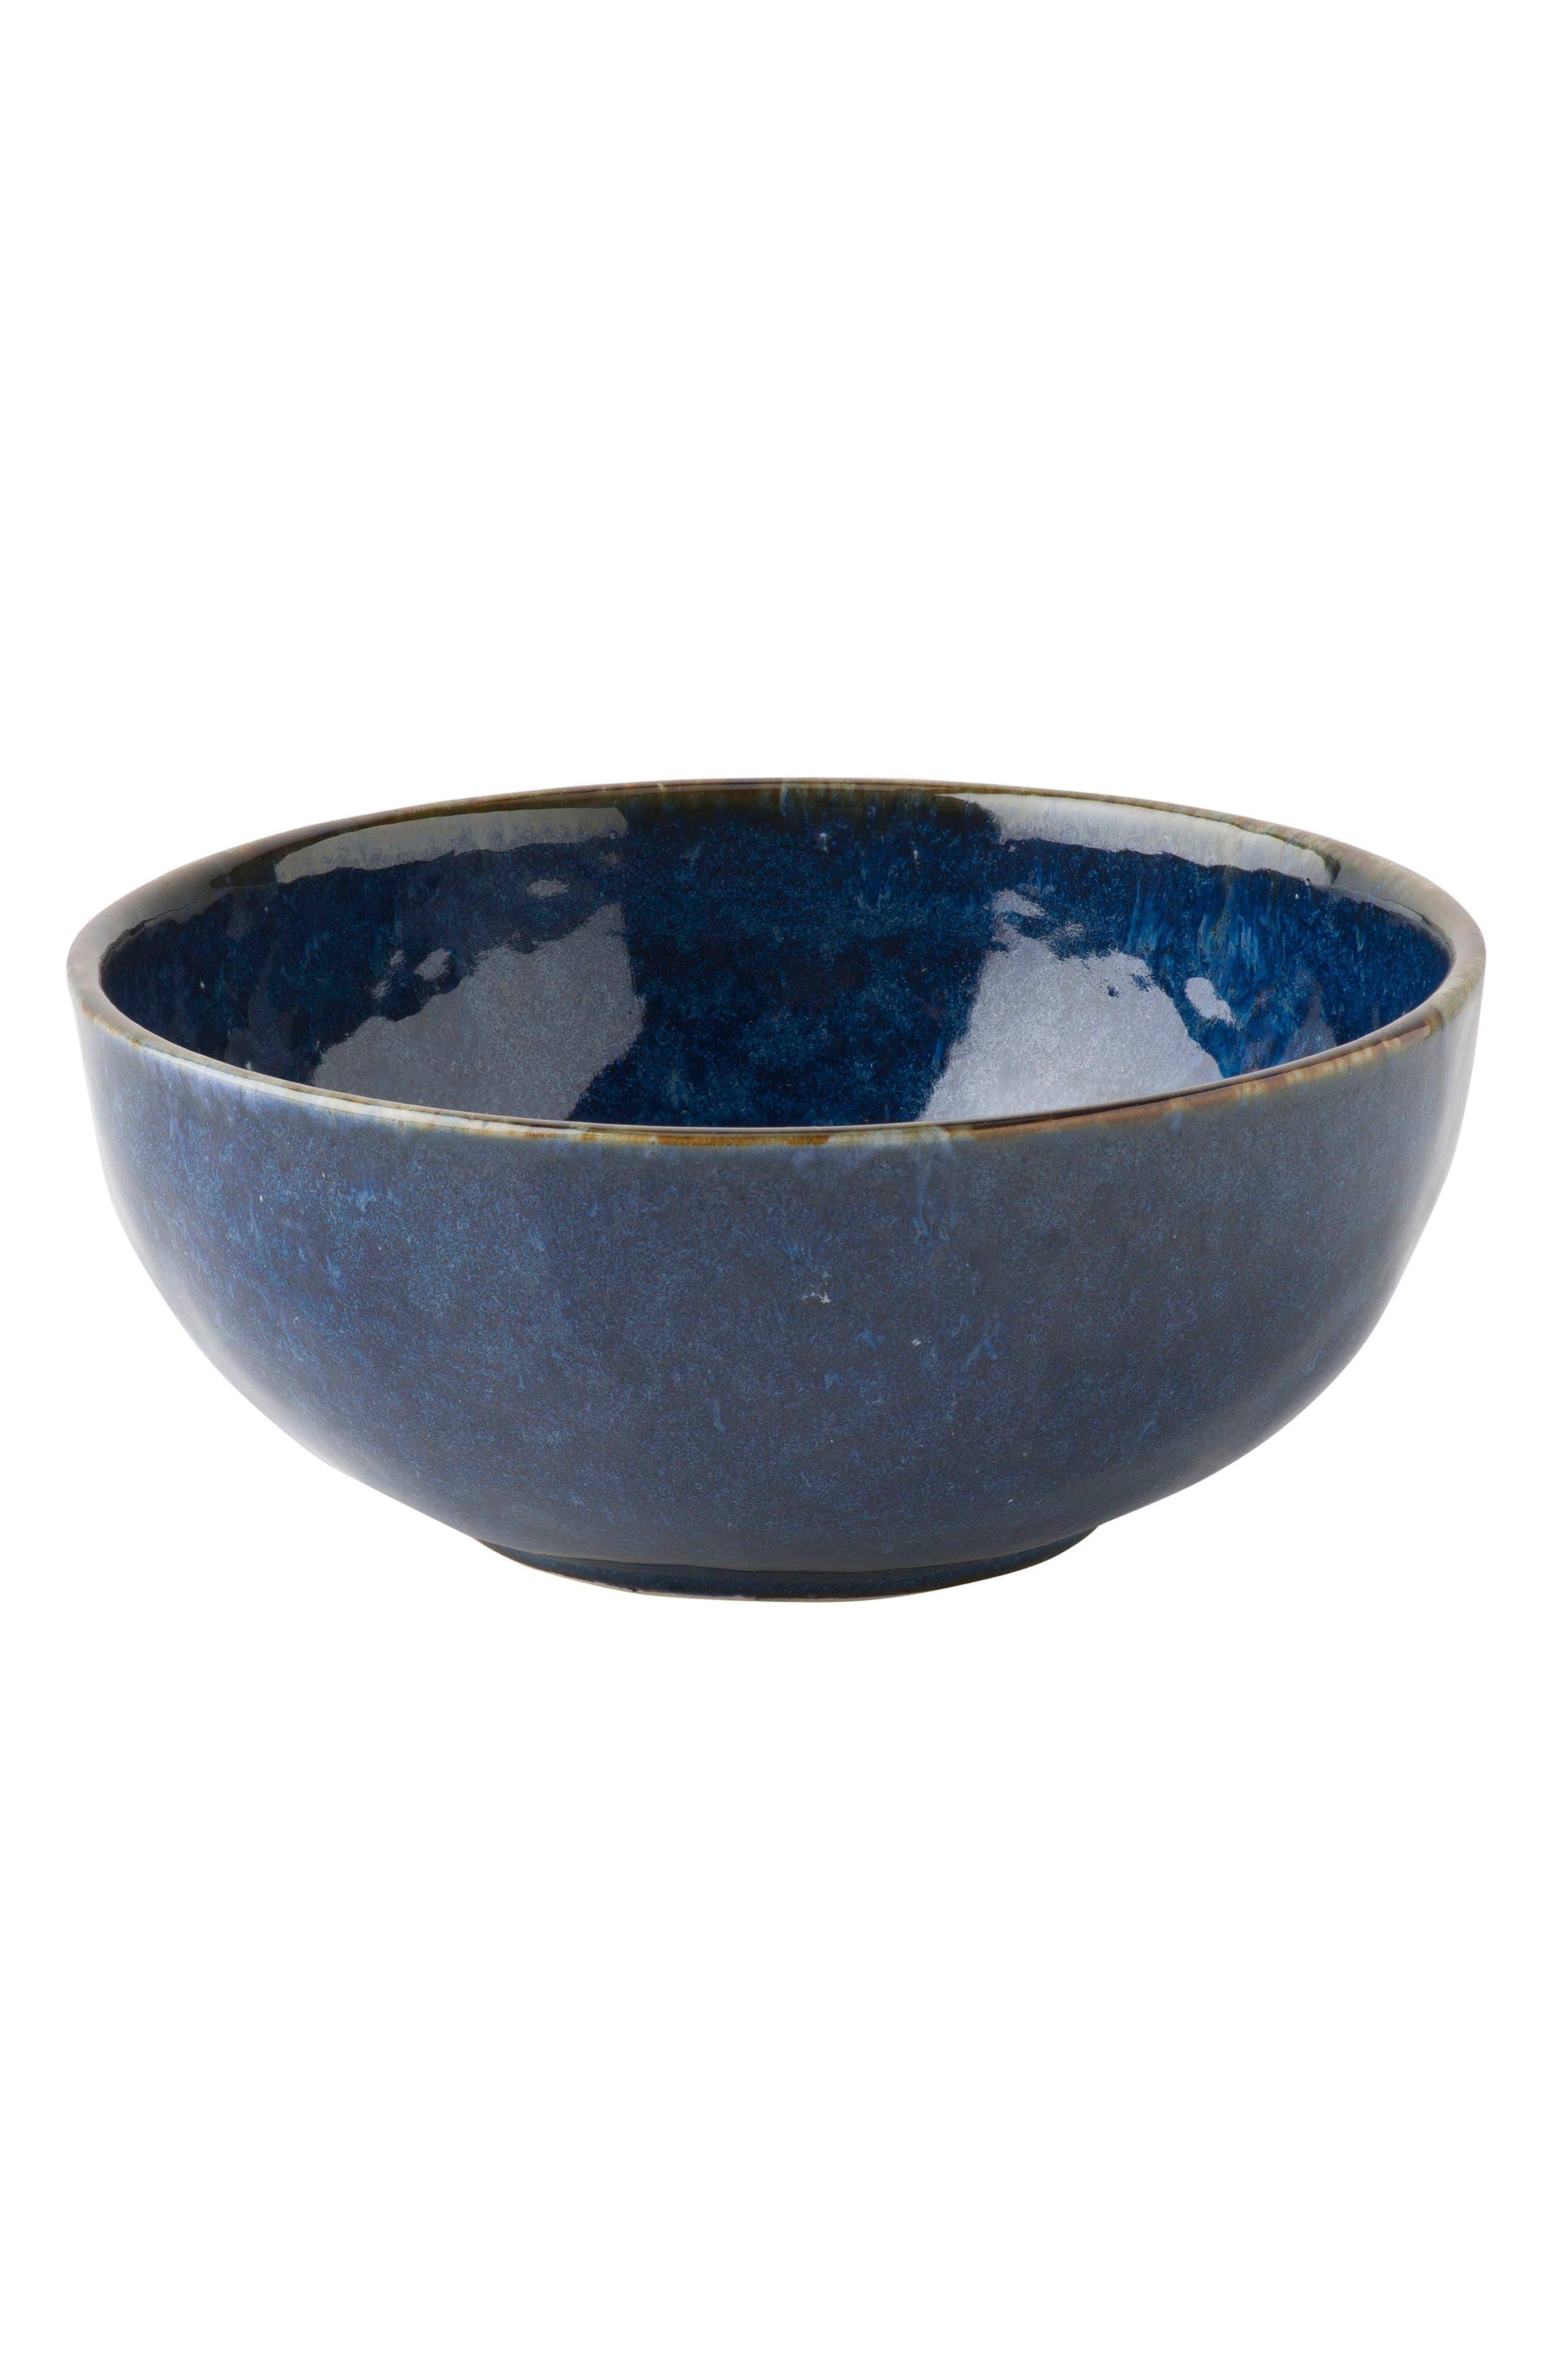 Puro Cobalt Ceramic Bowl,                             Main thumbnail 1, color,                             DAPPLED COBALT